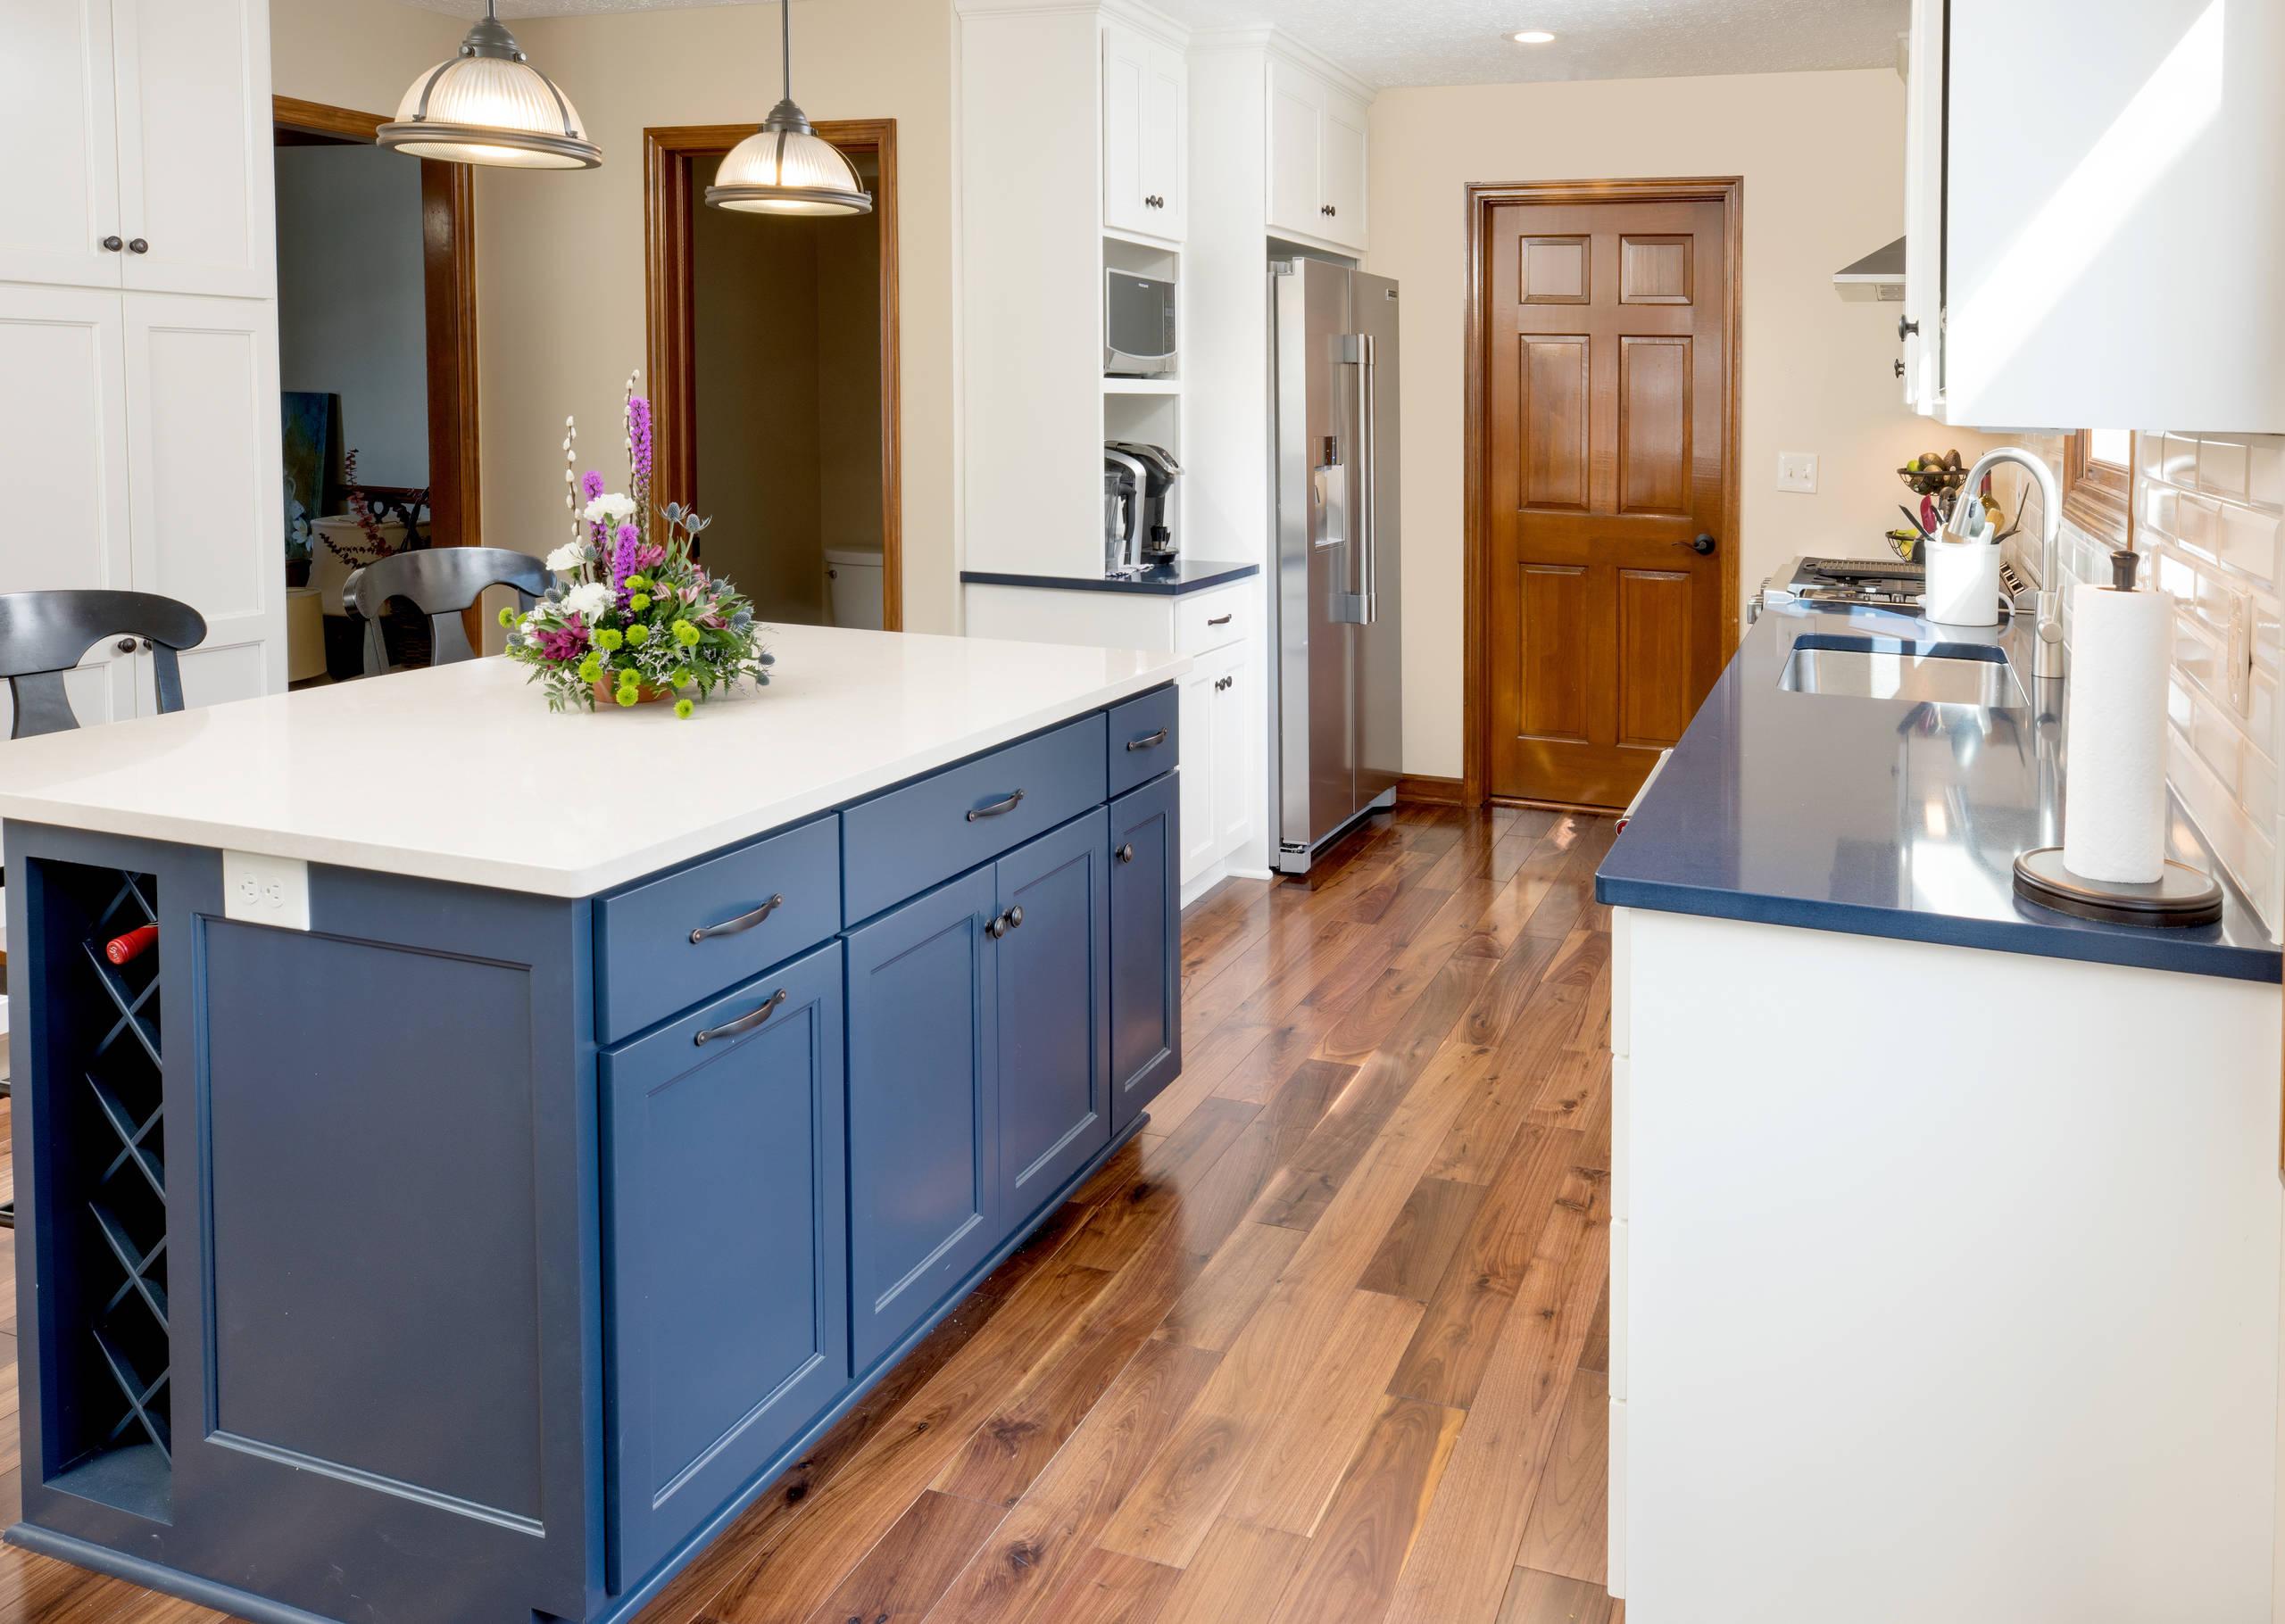 Transitional Blue Island Kitchen